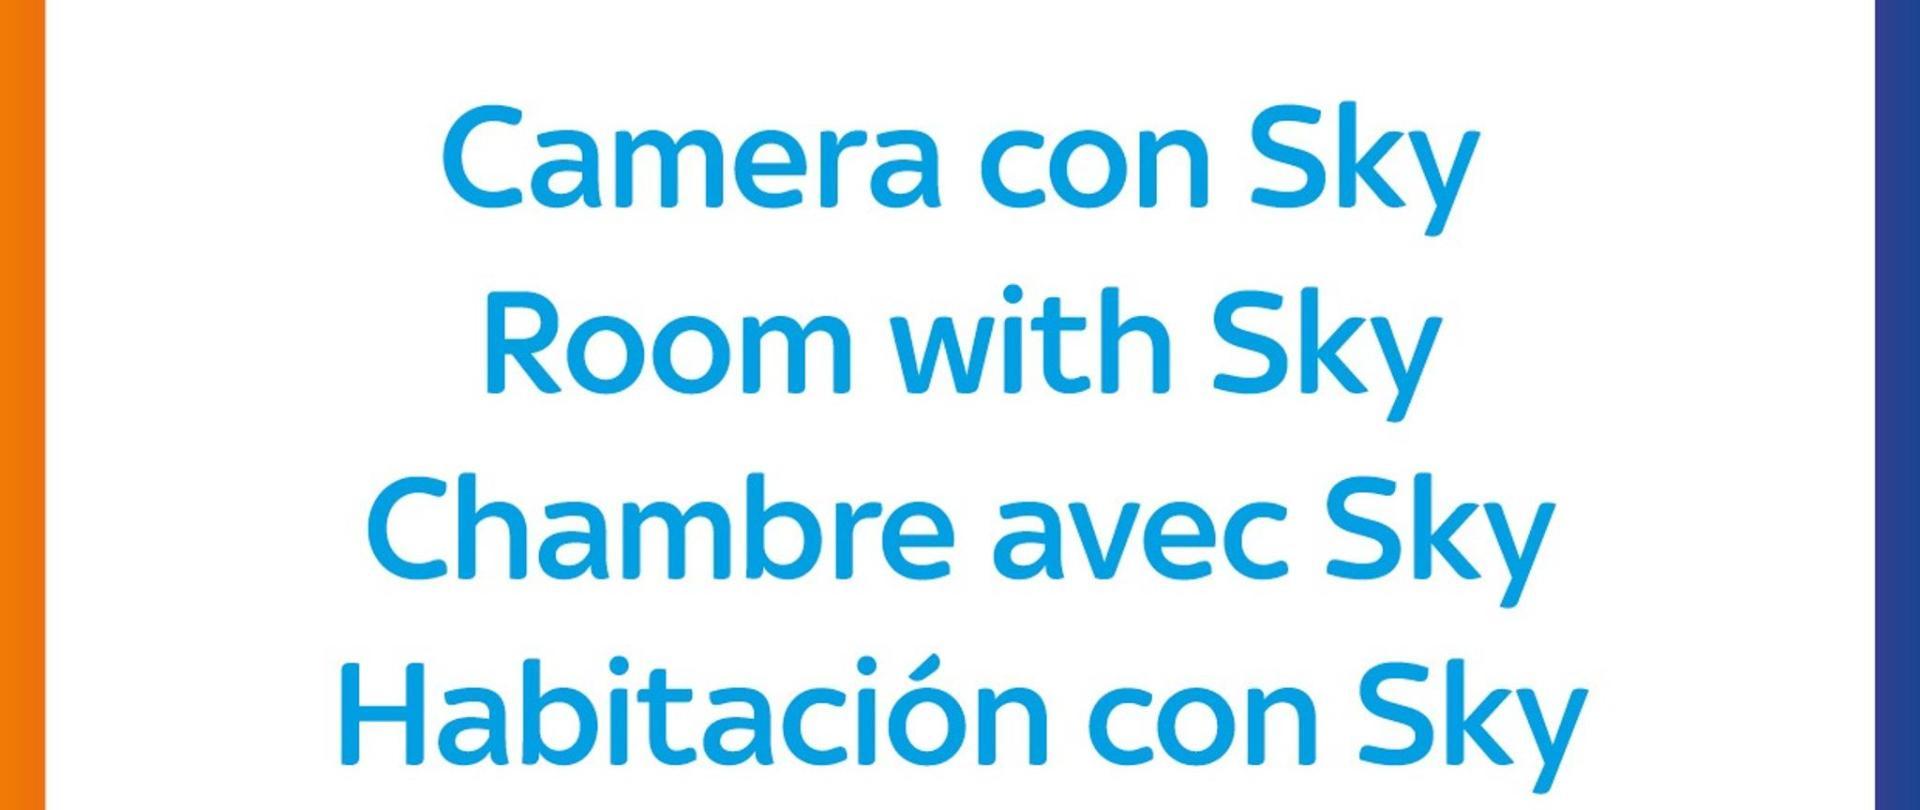 Sky_camera_con_sky_multilingua.jpg